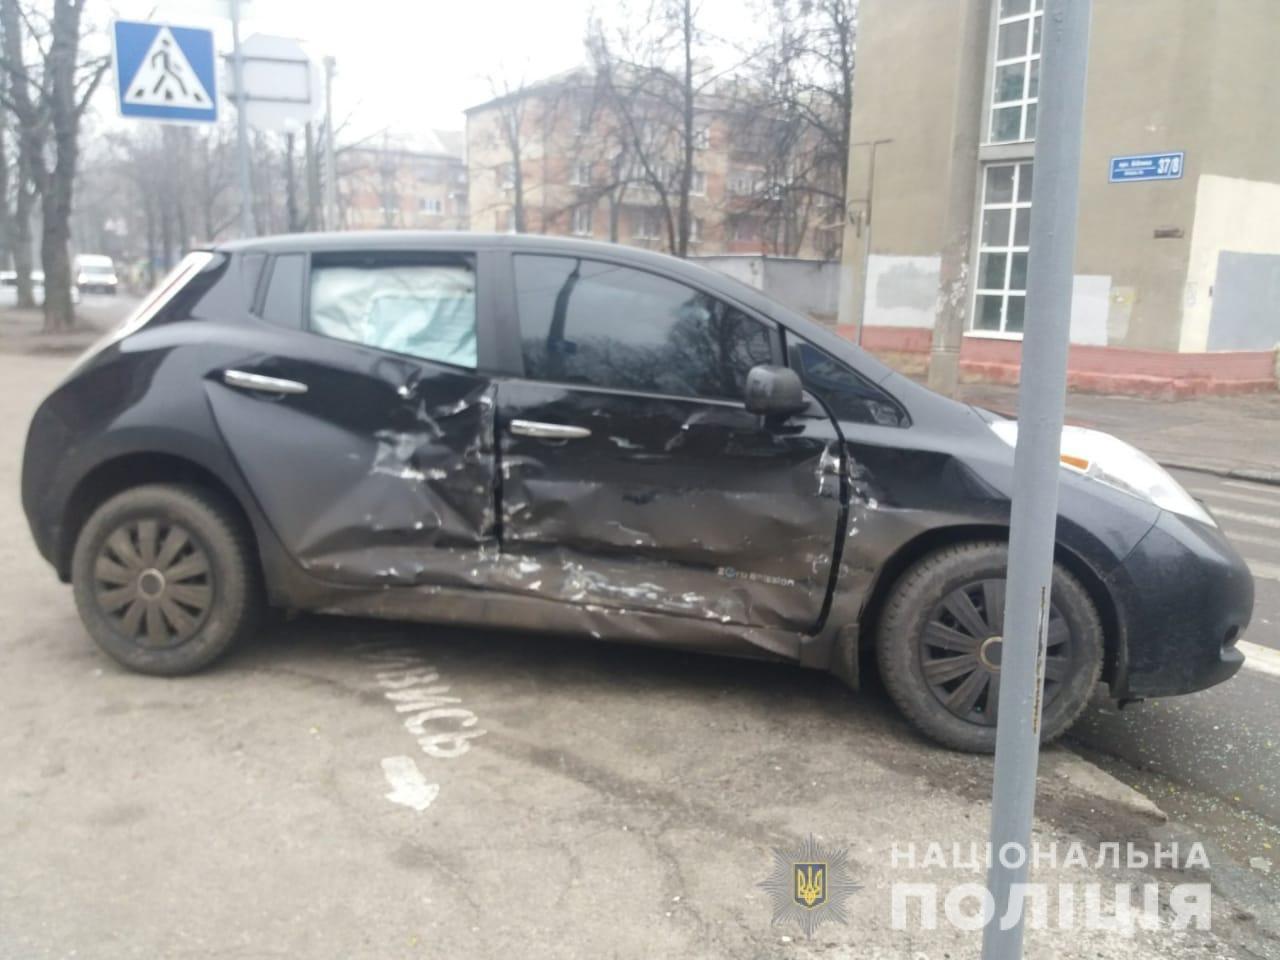 В Харькове столкнулись два автомобиля. Пострадал 6-летний ребенок, - ФОТО, фото-1